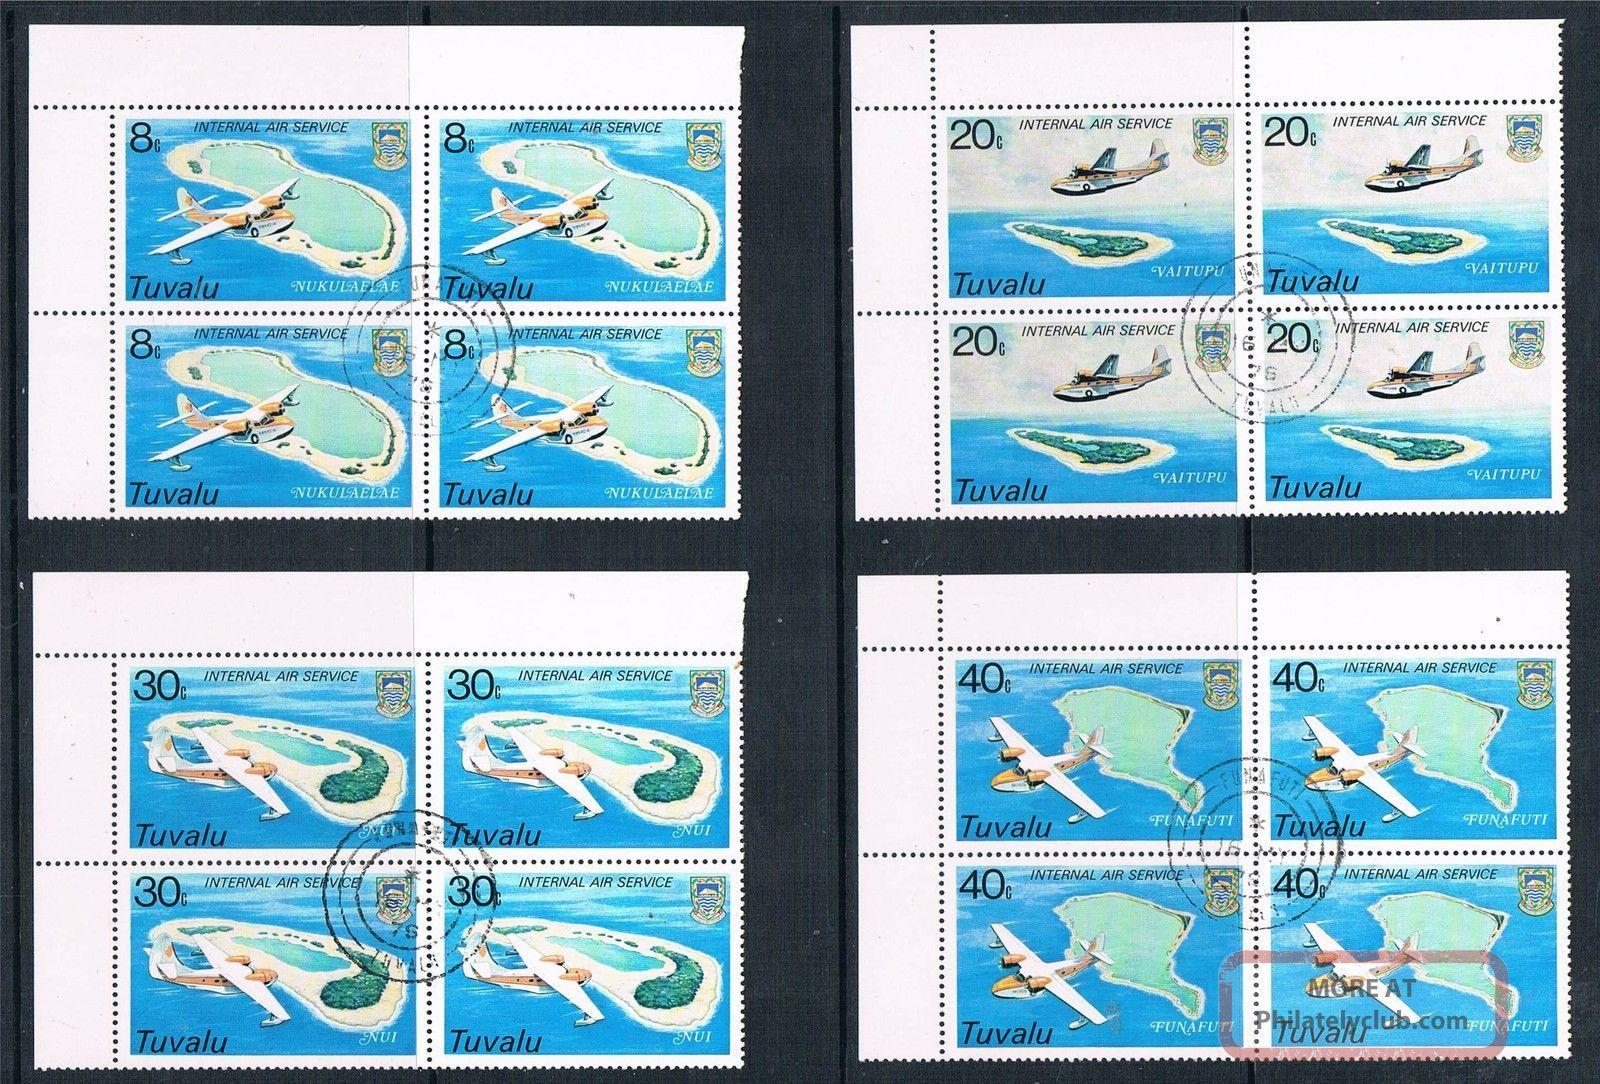 Tuvalu 1979 International Air Service Blk 4 Sg 127/30 Cto Australia & Oceania photo